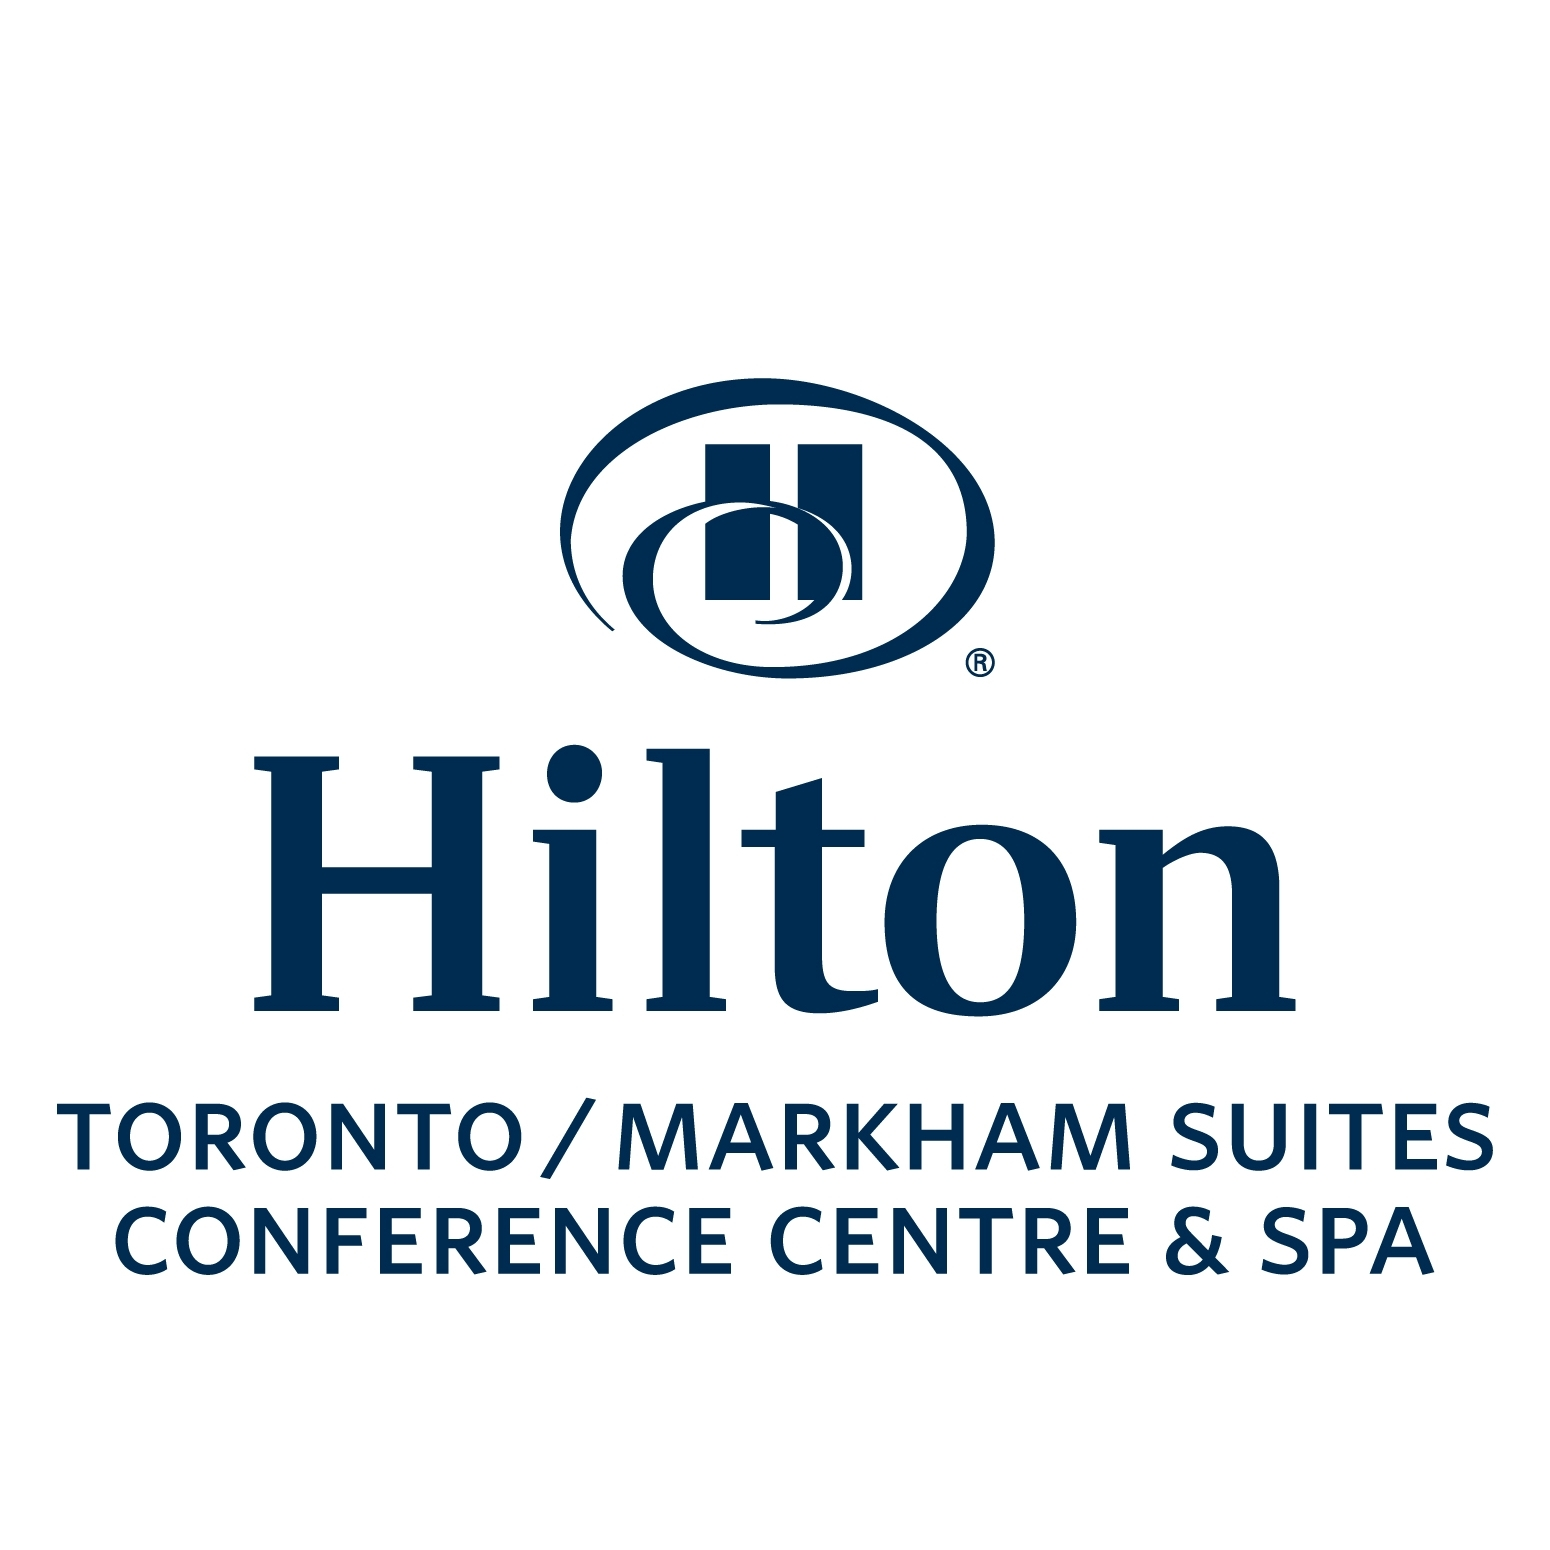 Hilton Toronto/Markham Suites Conference Centre & Spa logo